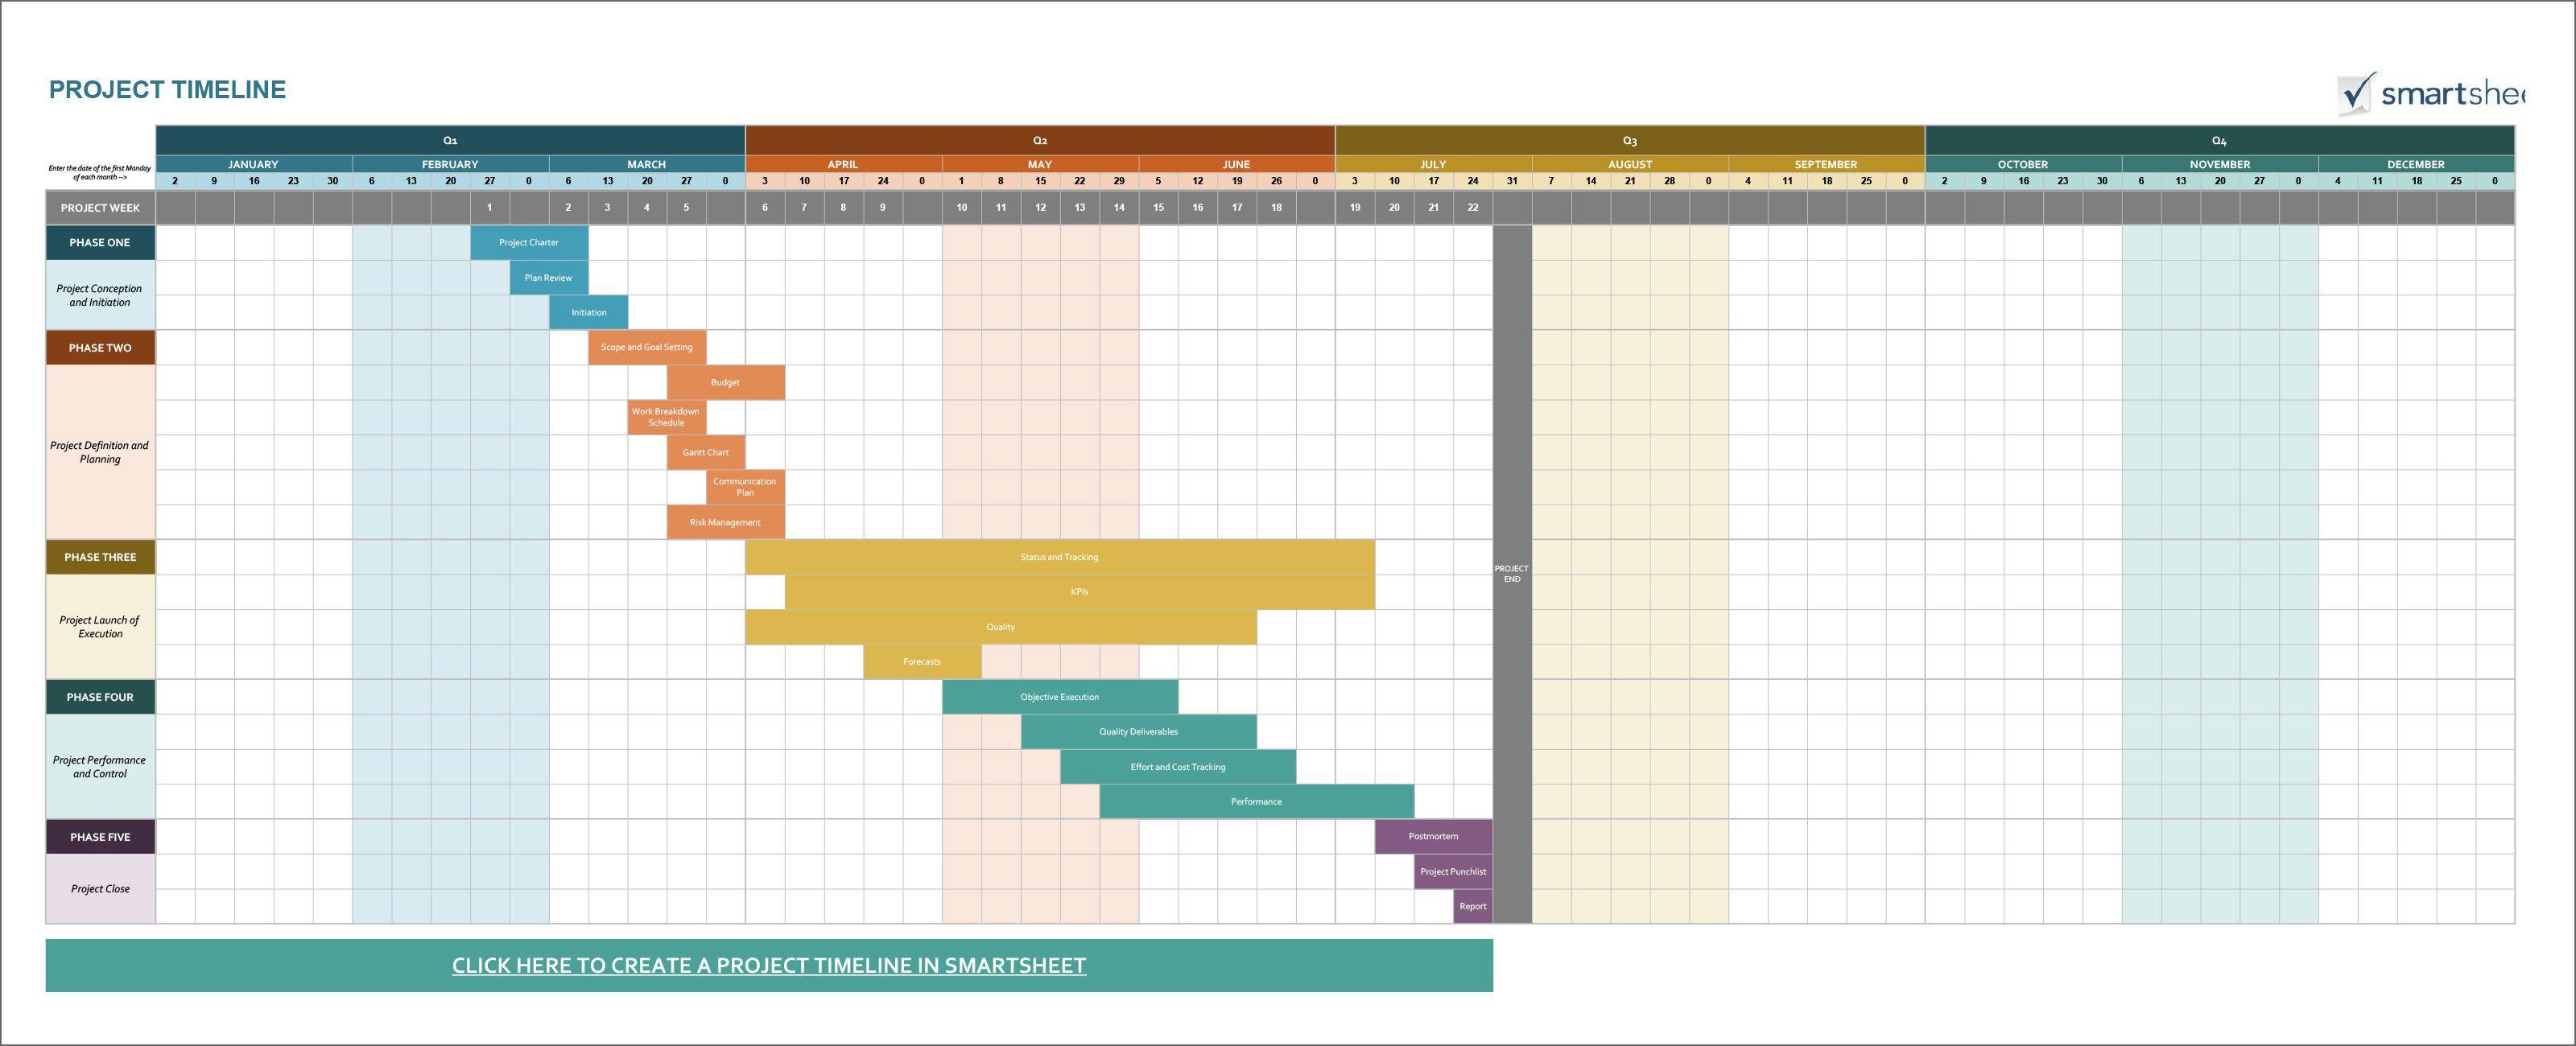 002 Breathtaking Excel Project Timeline Template High Def  2020 Xl TutorialFull